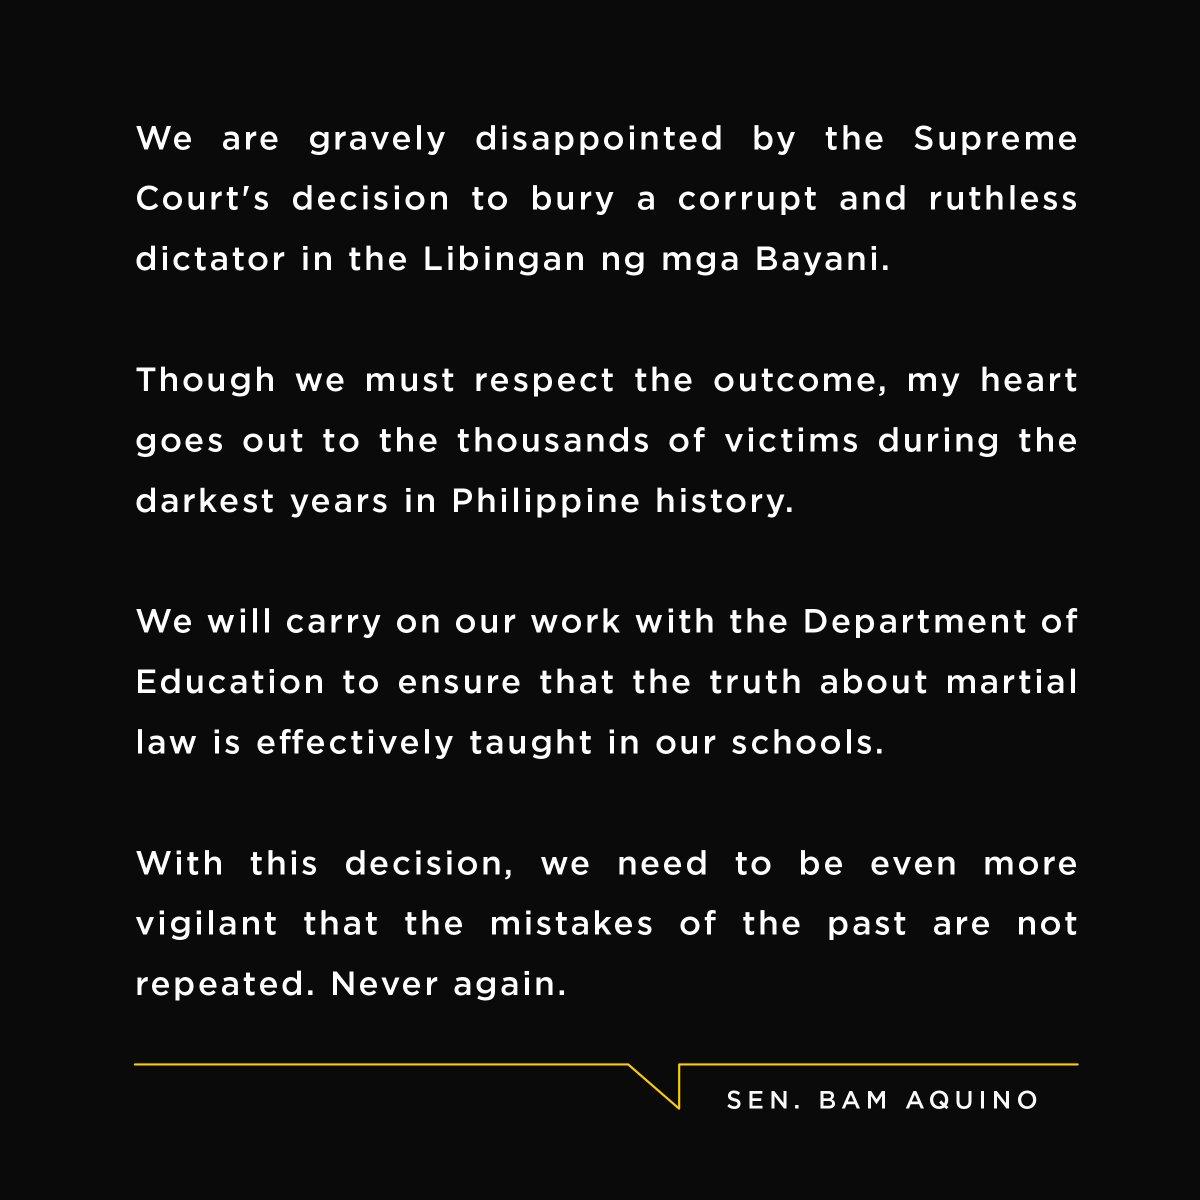 Sen. Bam Aquino on SC decision allowing Marcos' burial in LNMB. https://t.co/idlFXd3VGo